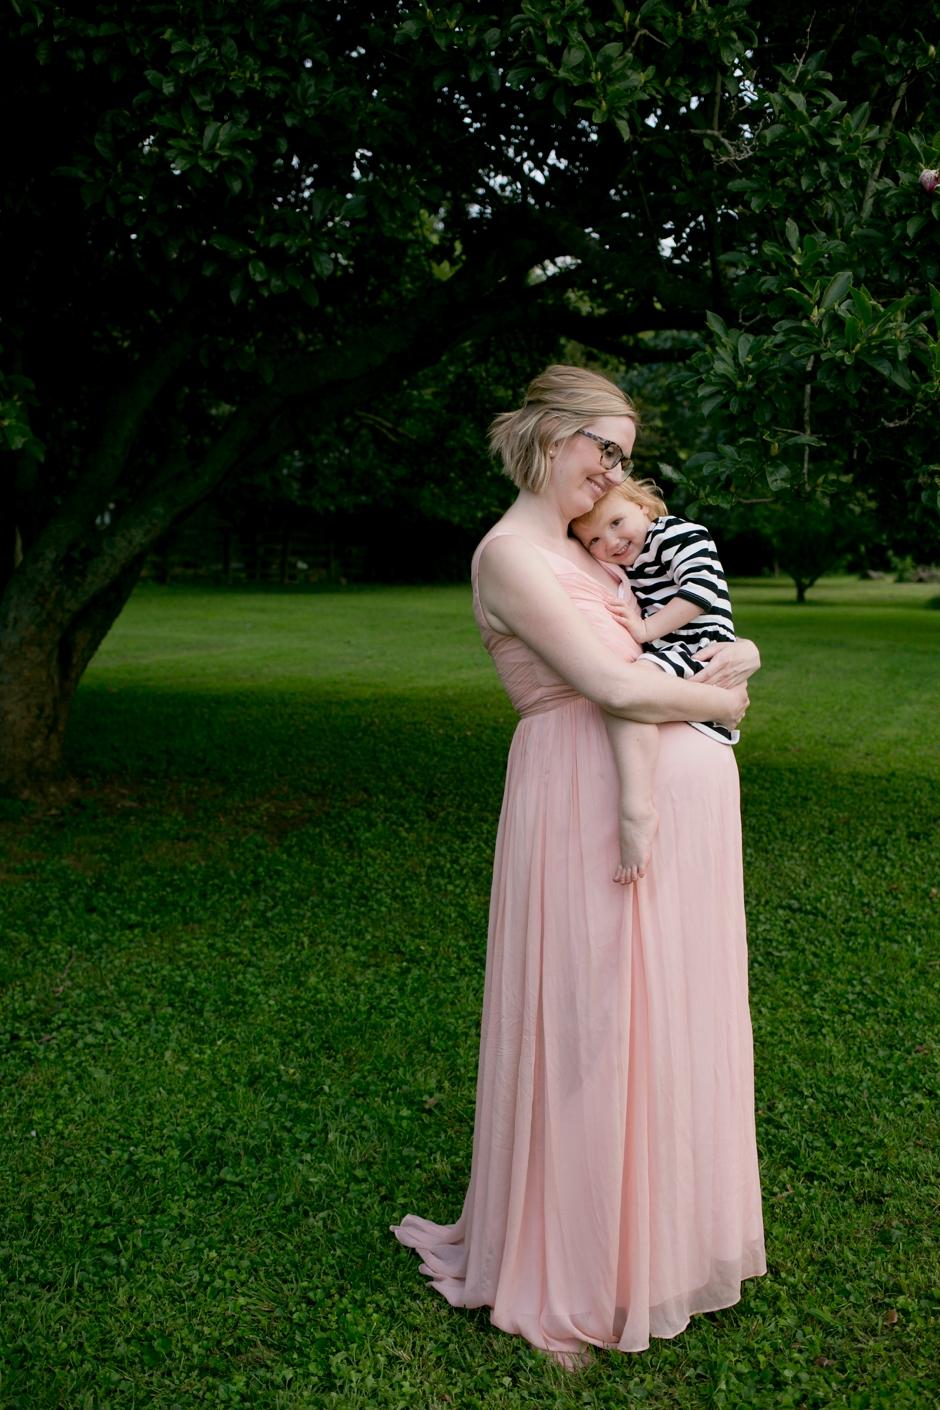 kentucky-maternity-jcrew-dress-1203